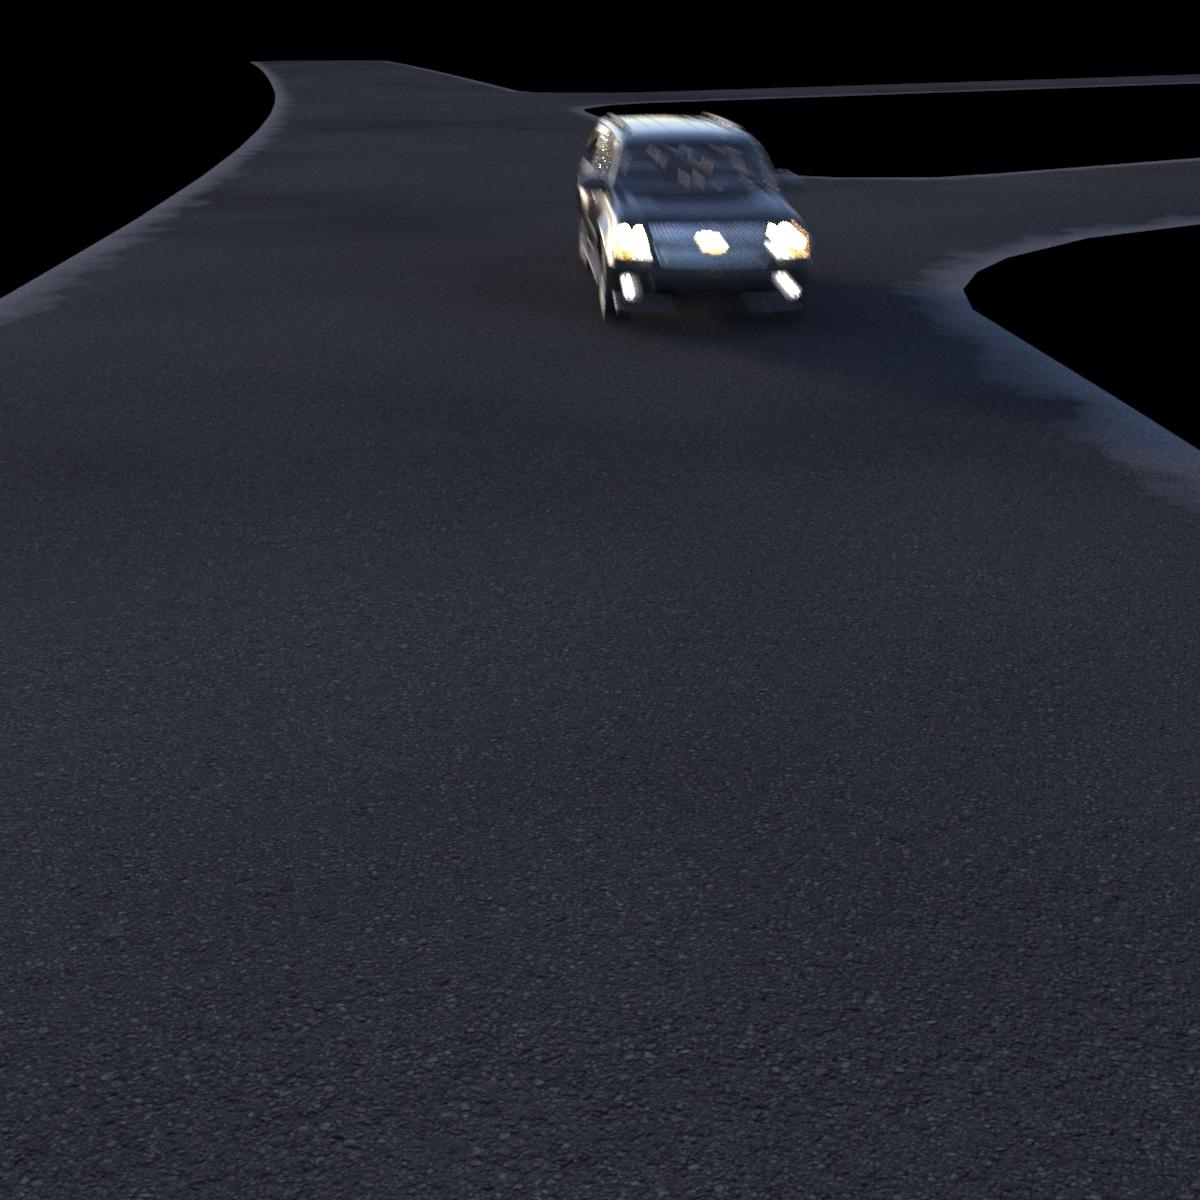 Road_DiffuseMixedNoise_Composite2